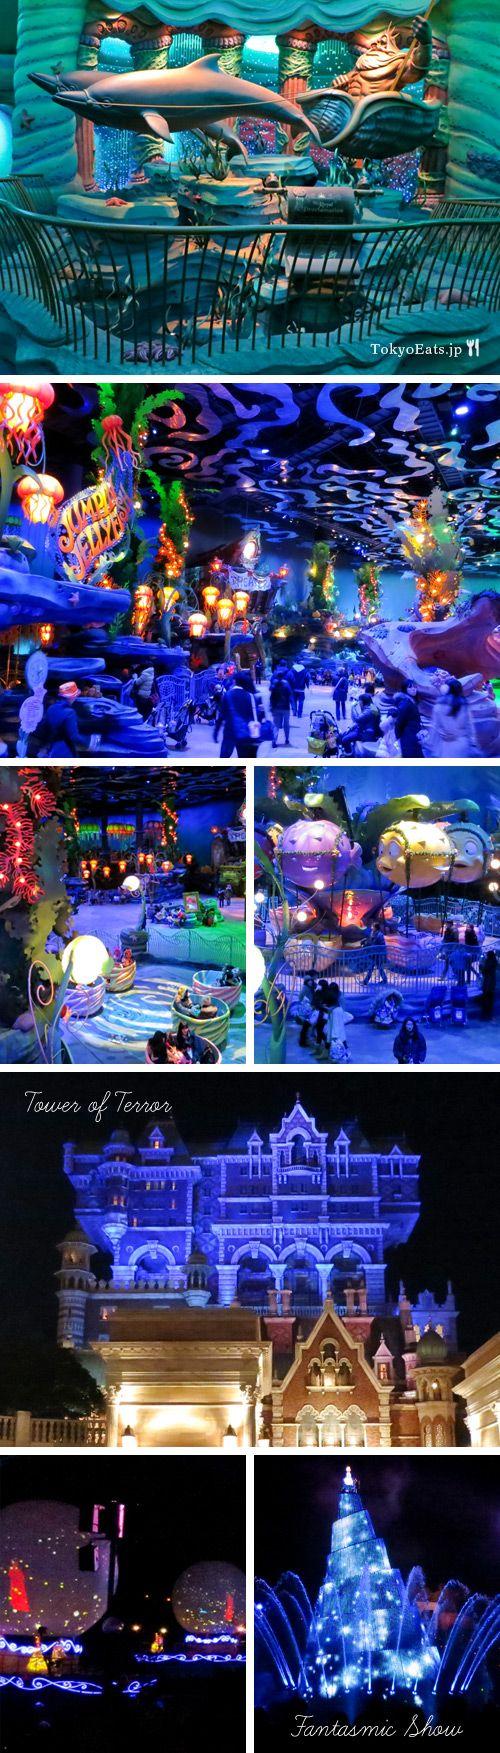 Mermaid Lagoon & other attractions, Tokyo Disney Sea